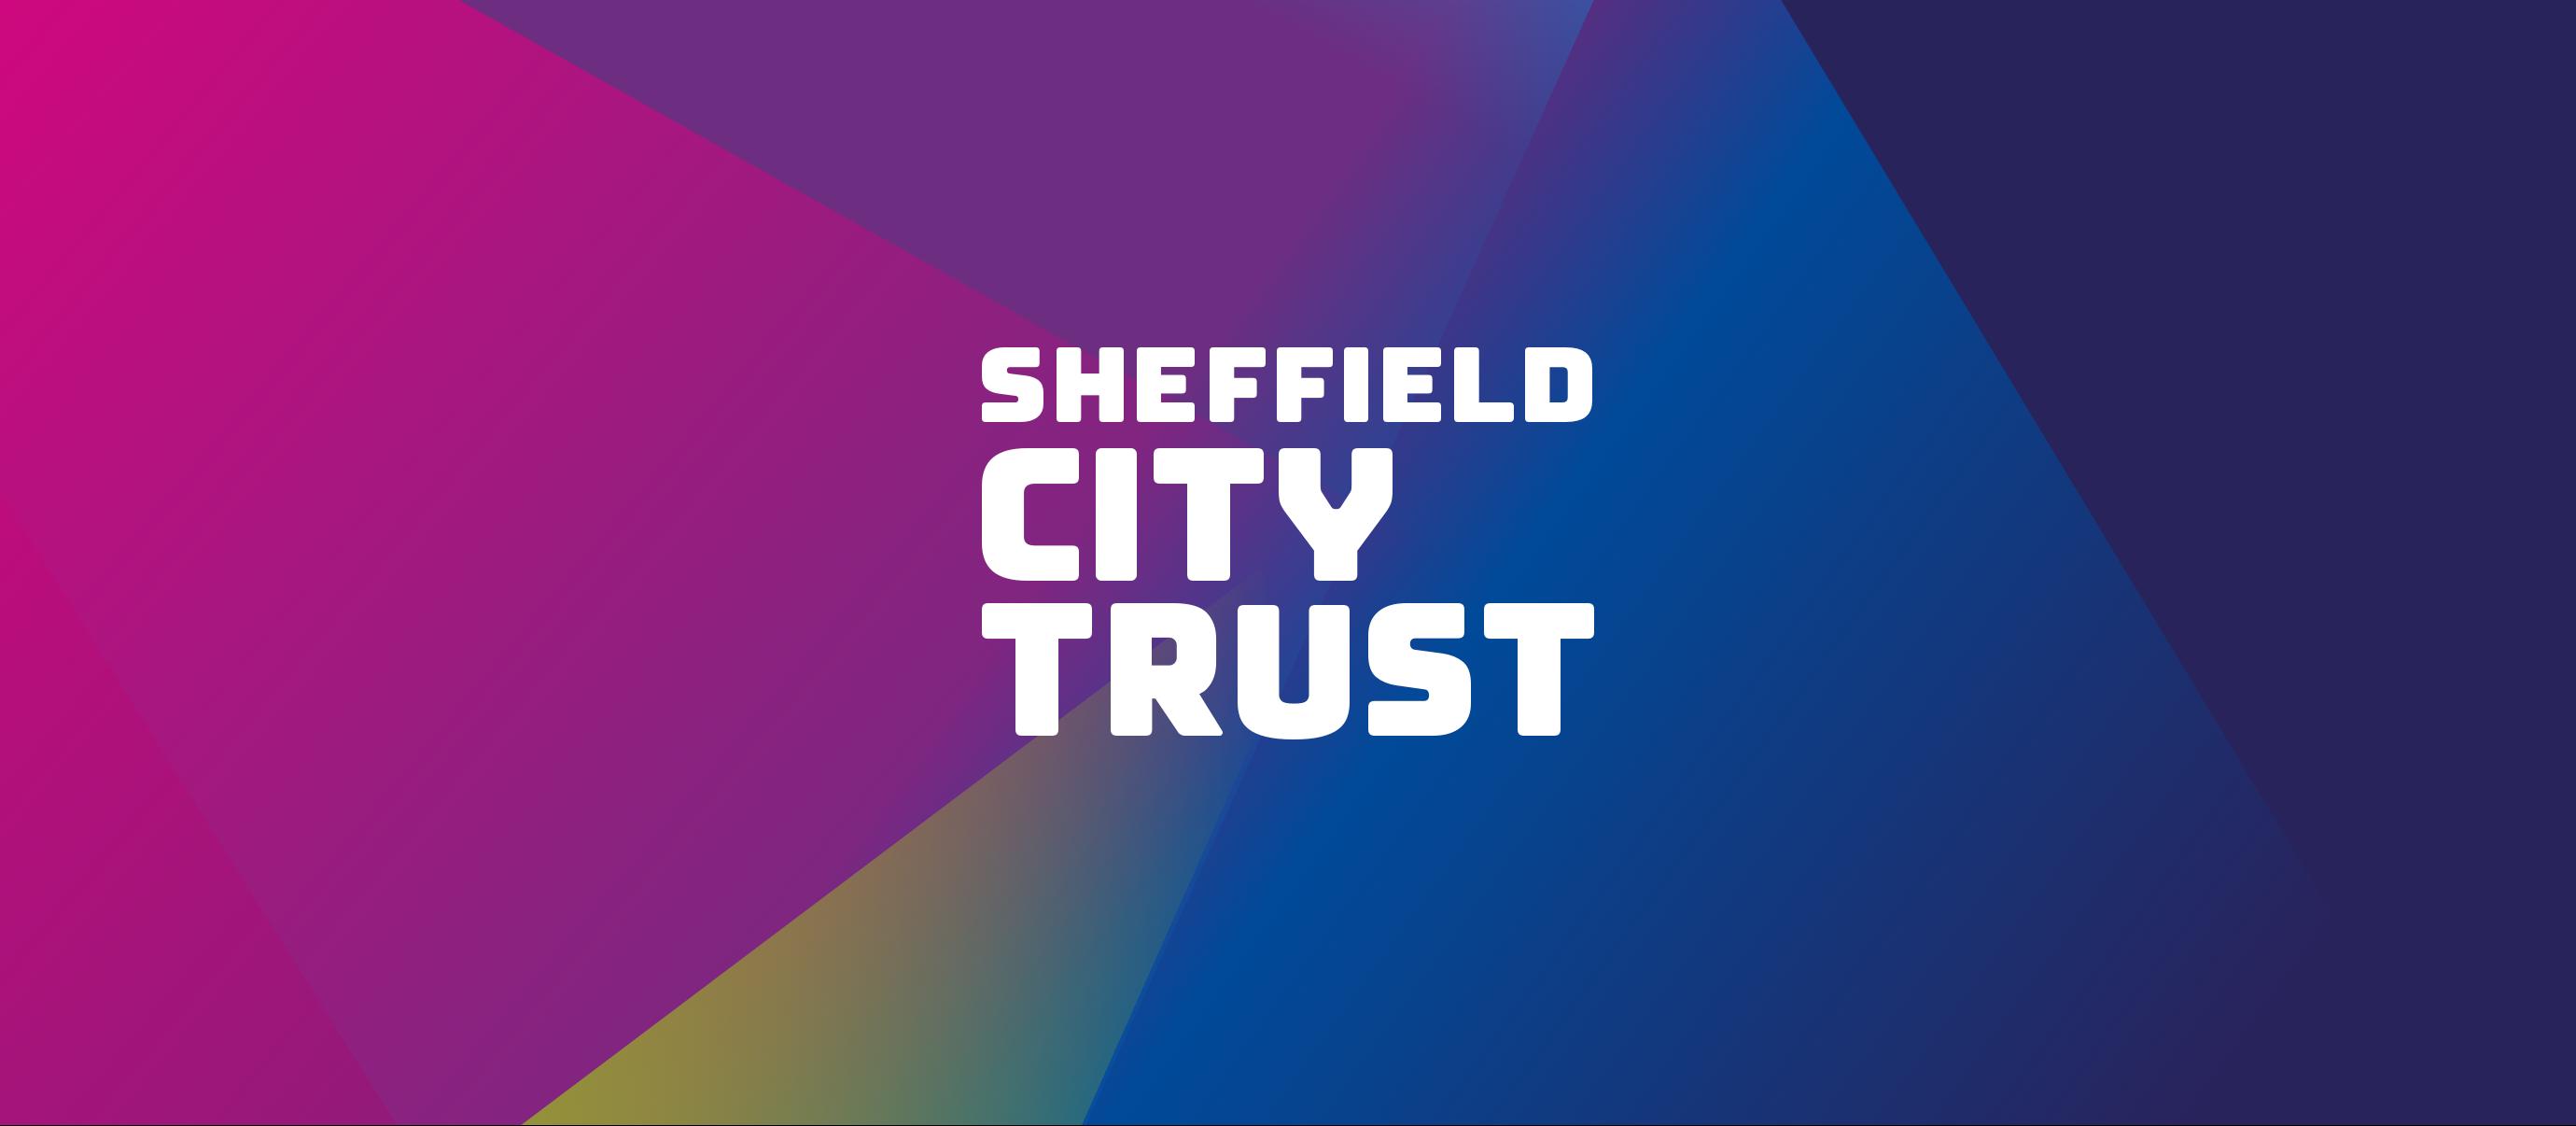 Sheffield City Trust logo on colourful background